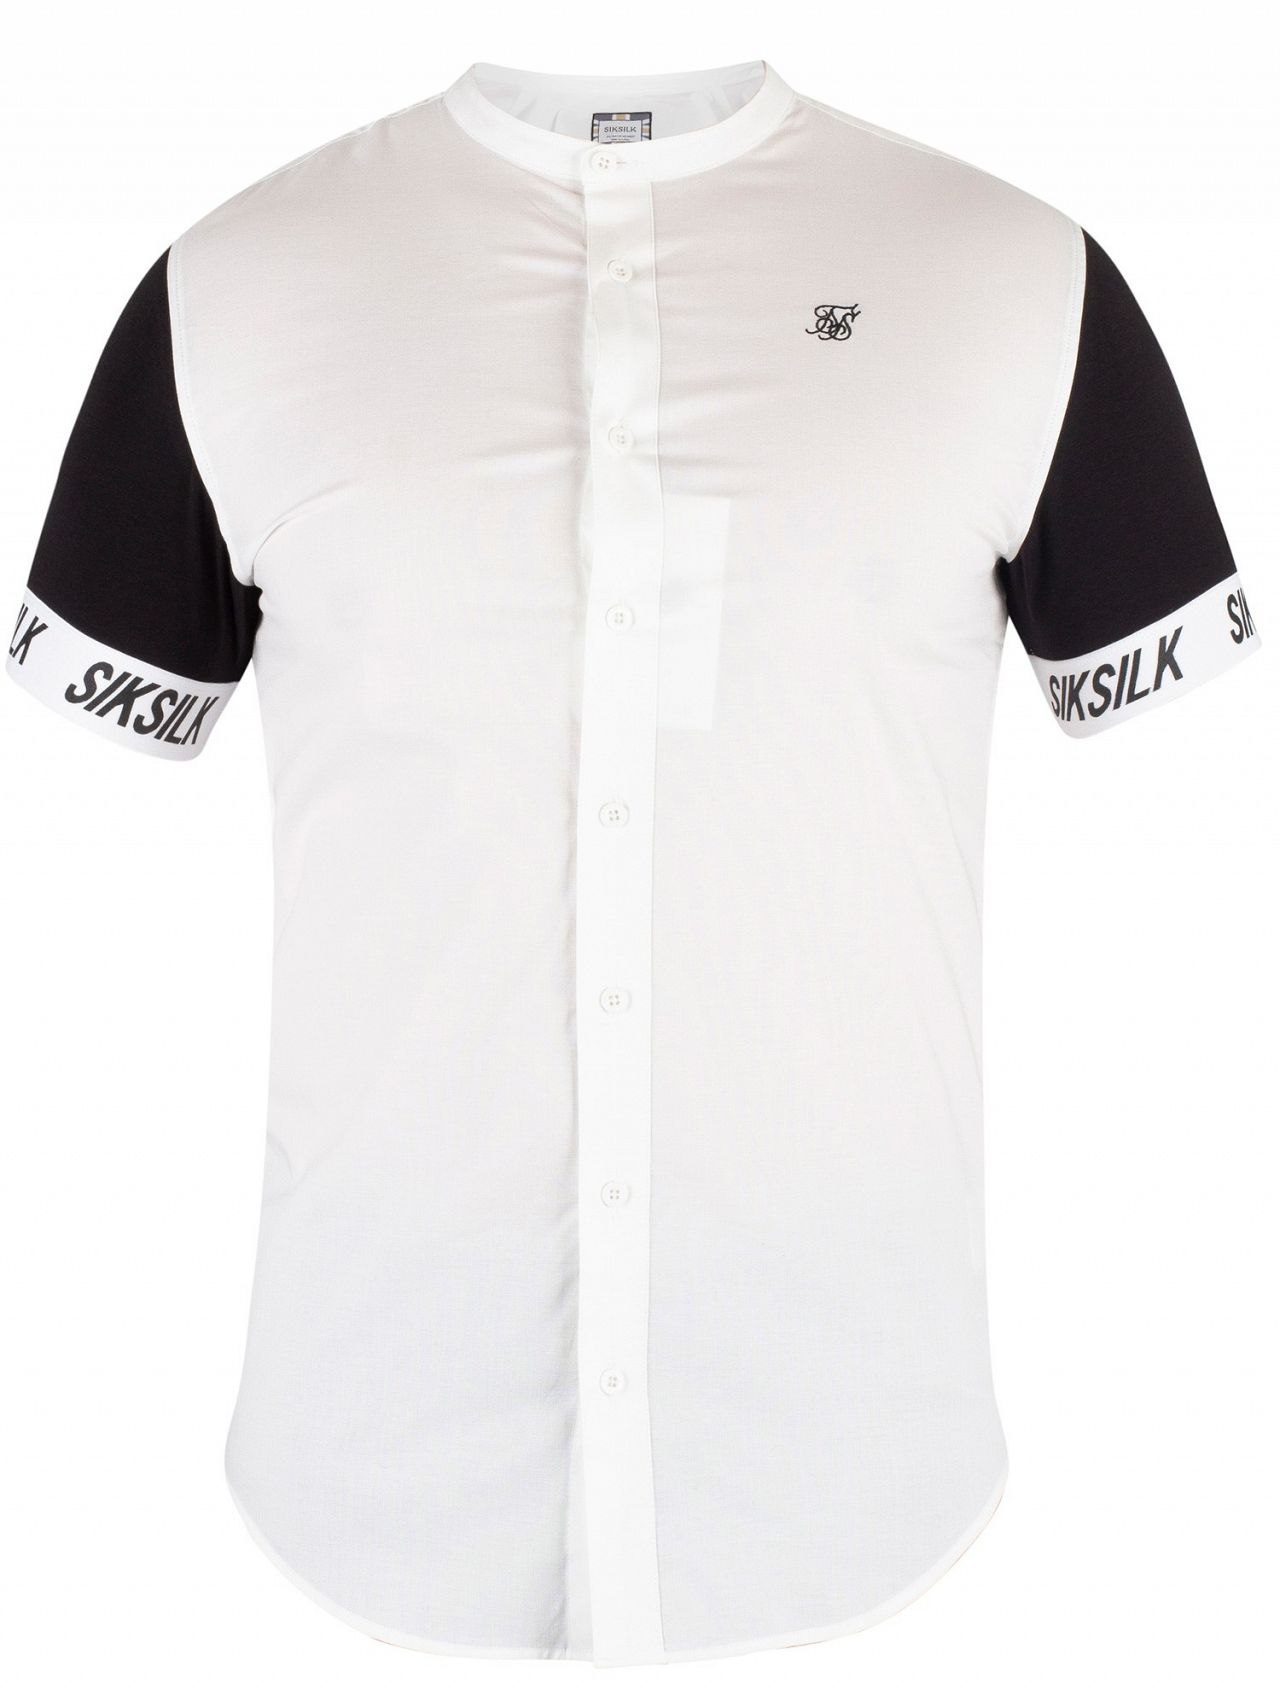 1275a69d88020d Sik Silk White/Black Grandad Collar Tech Shirt | Standout